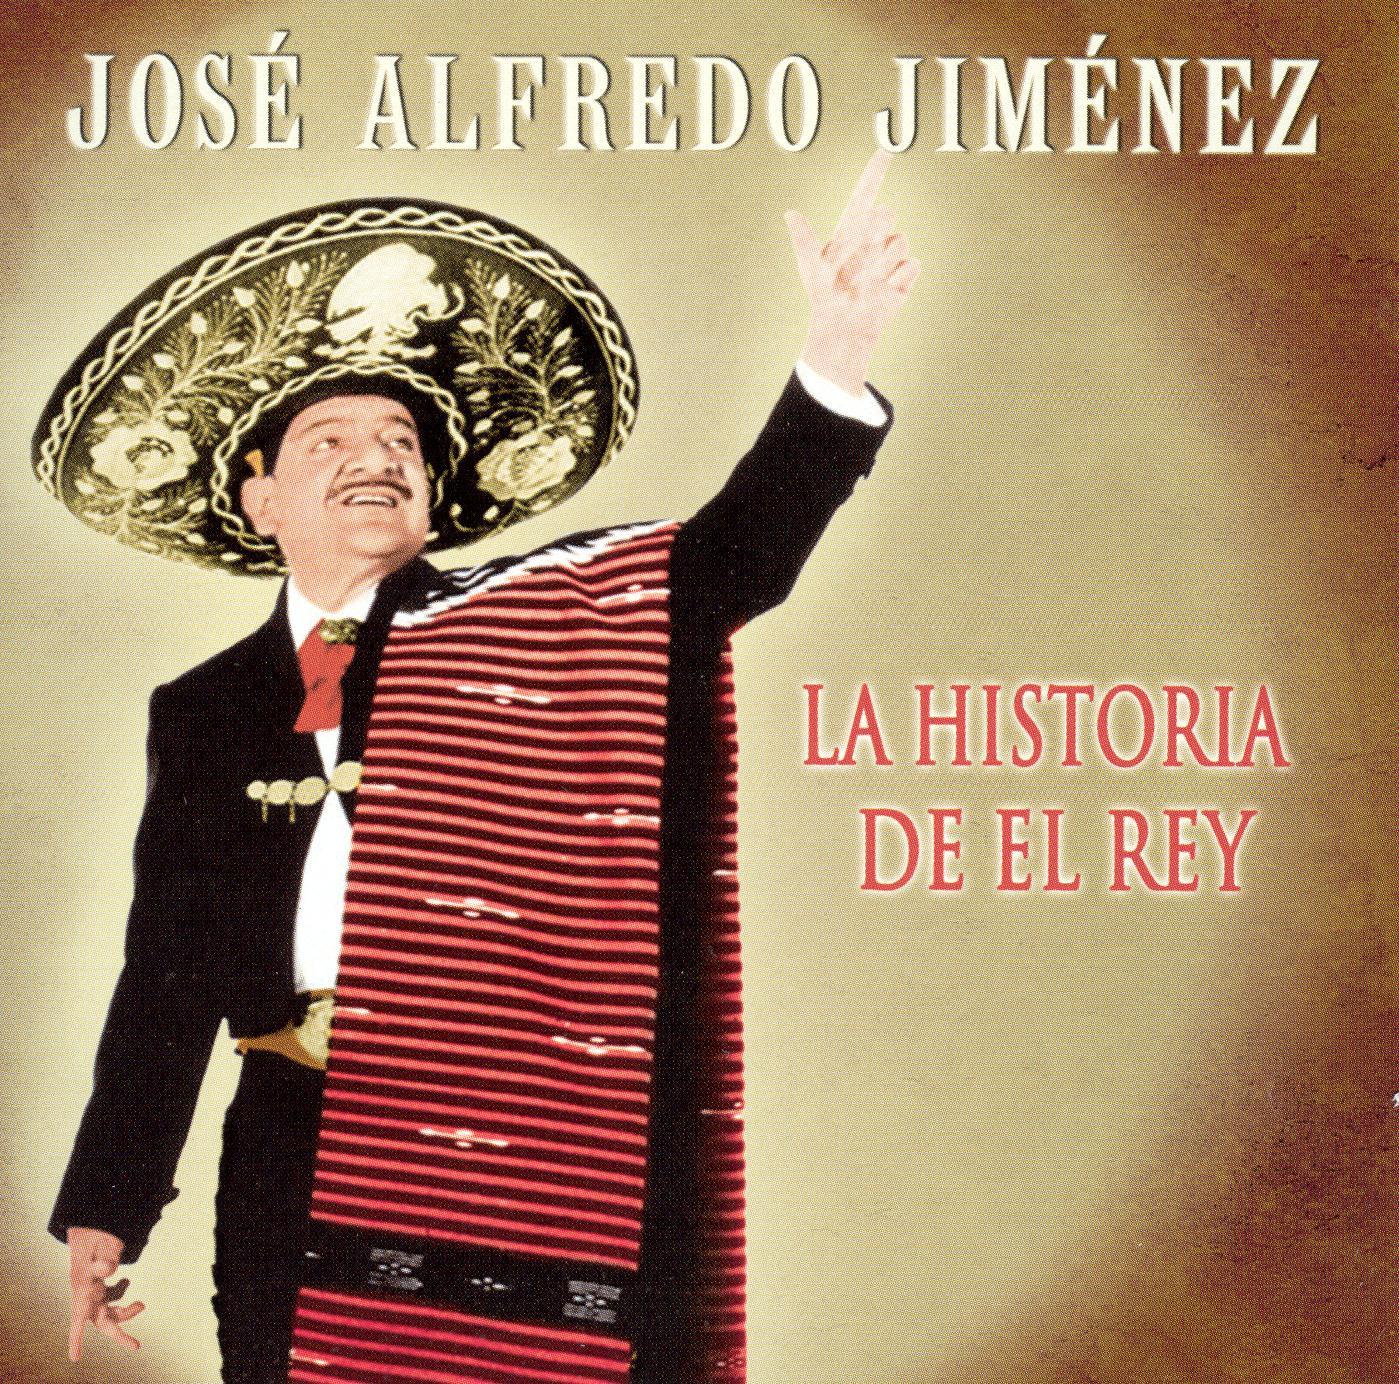 Jose Alfredo Jimenez: La Historia del Rey